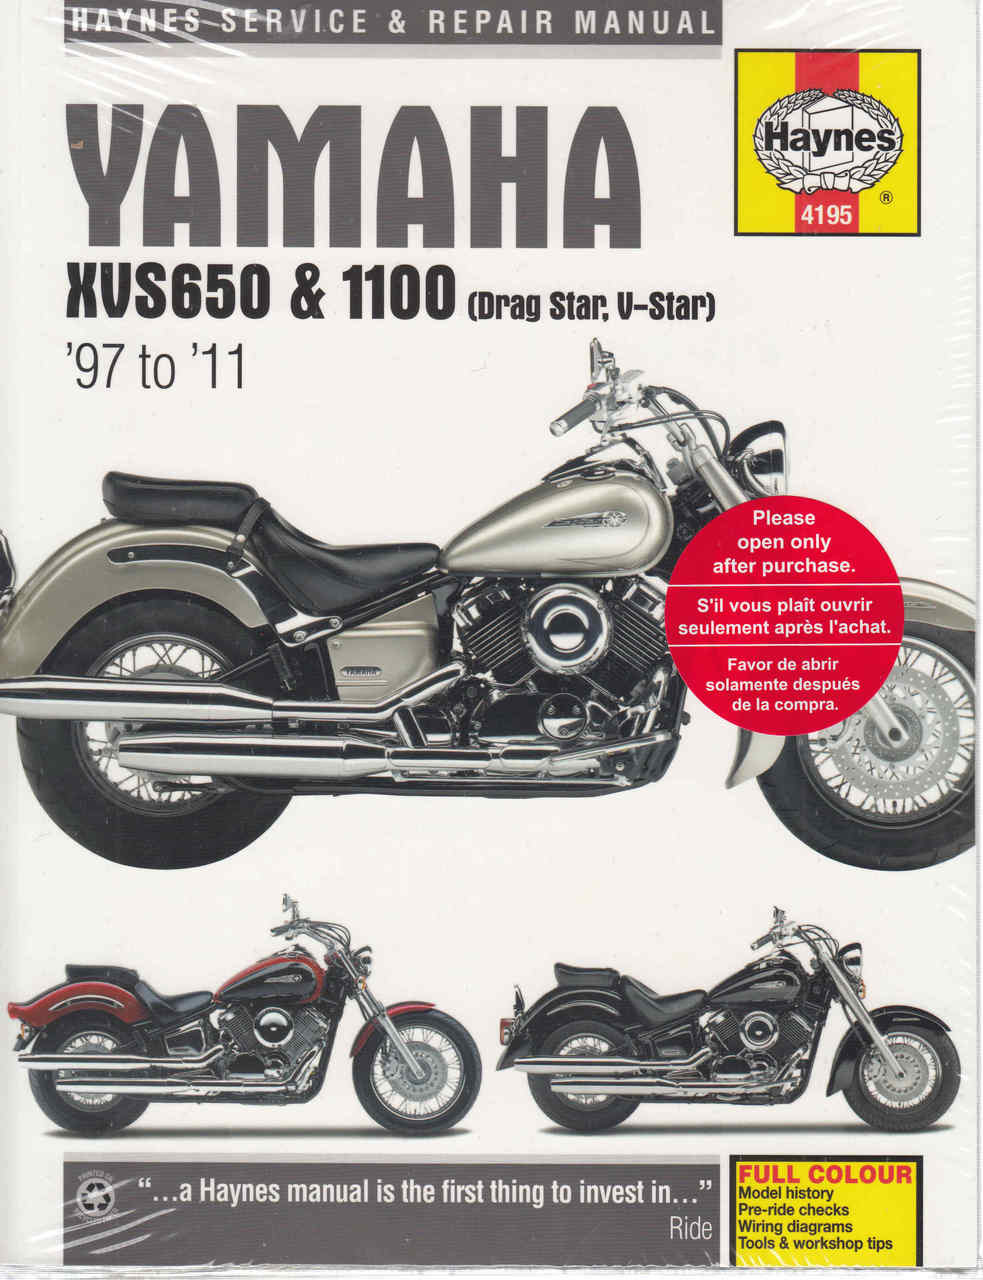 medium resolution of yamaha xvs650 amp xvs1100 drag star v star 1997 2005 workshop manual